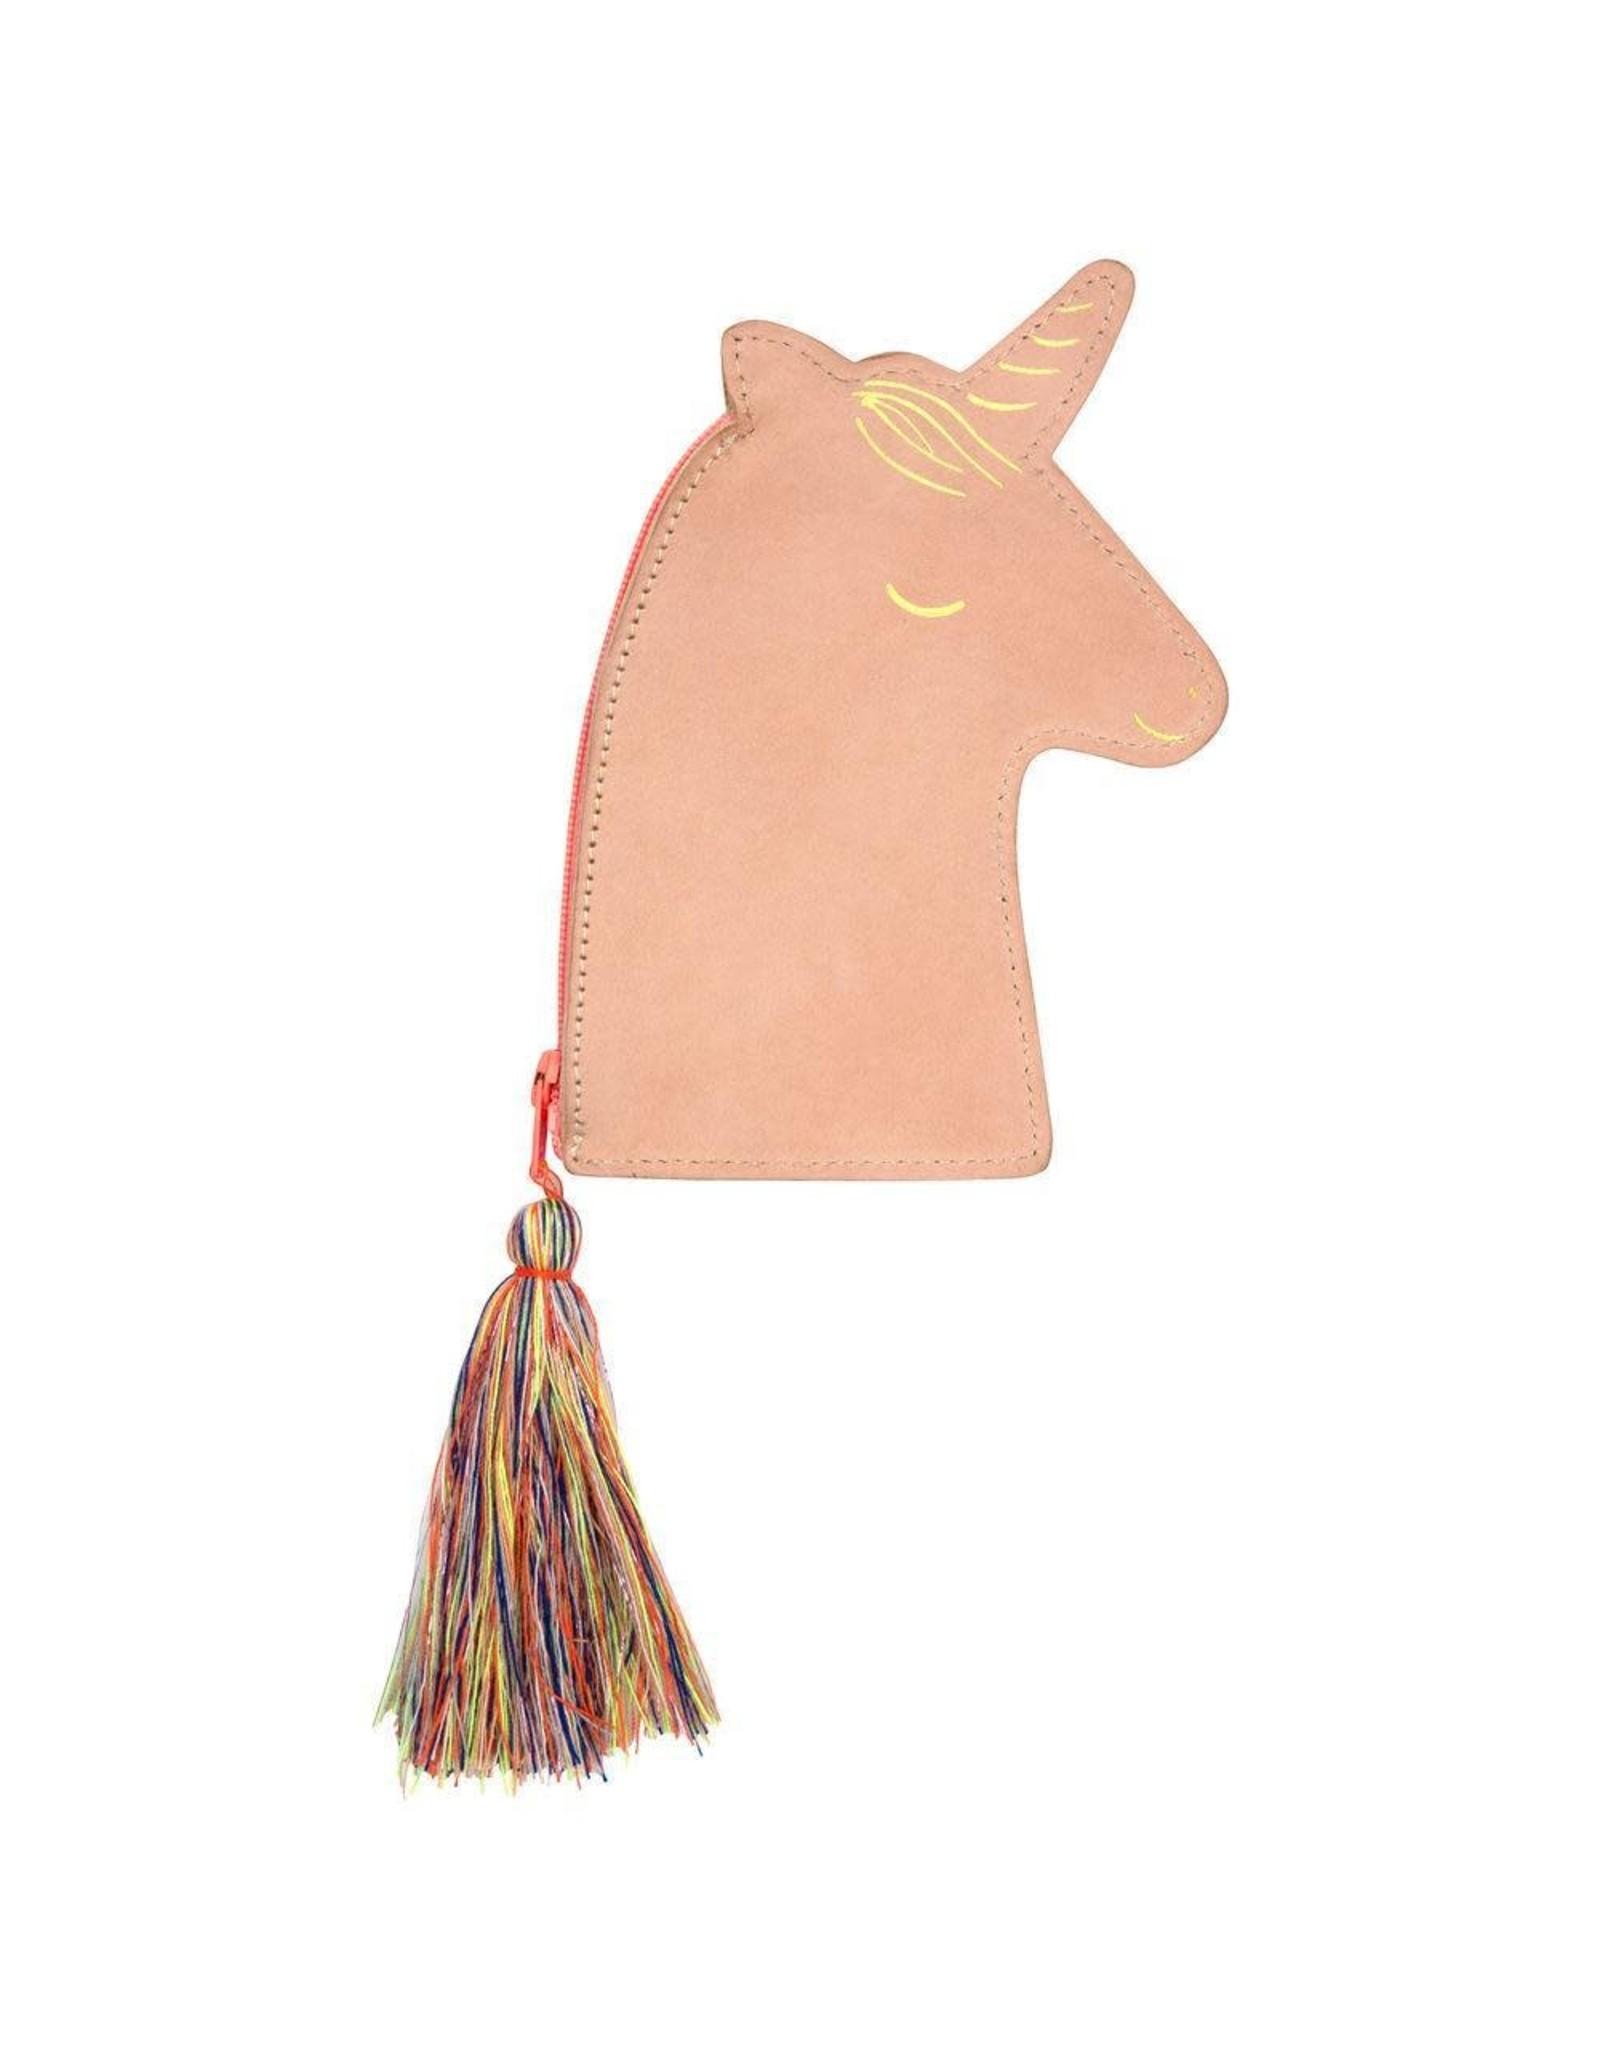 Meri Meri Ritstasje   Unicorn